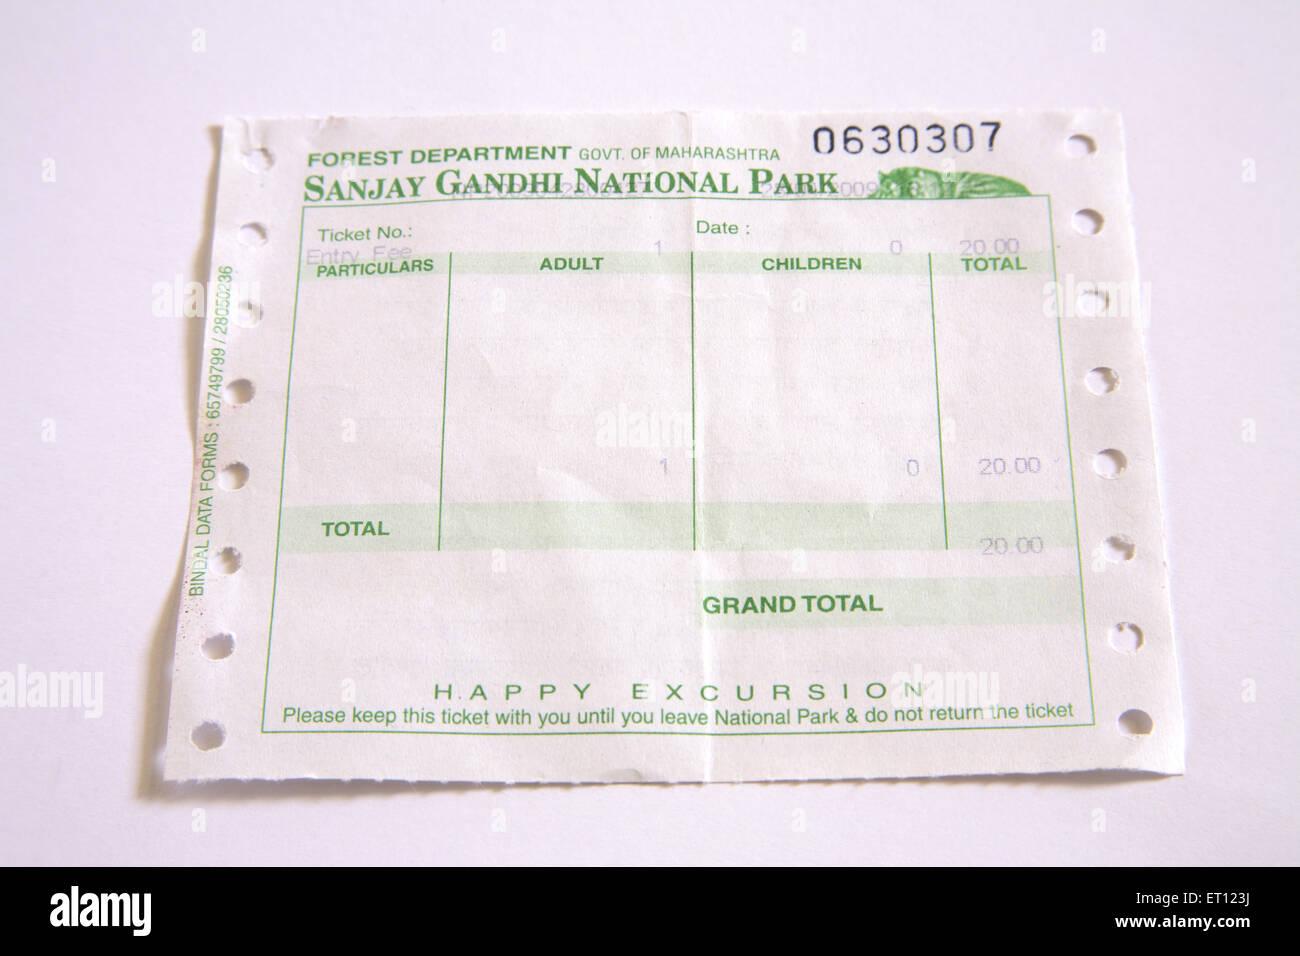 Entry Ticket Stockfotos & Entry Ticket Bilder - Alamy